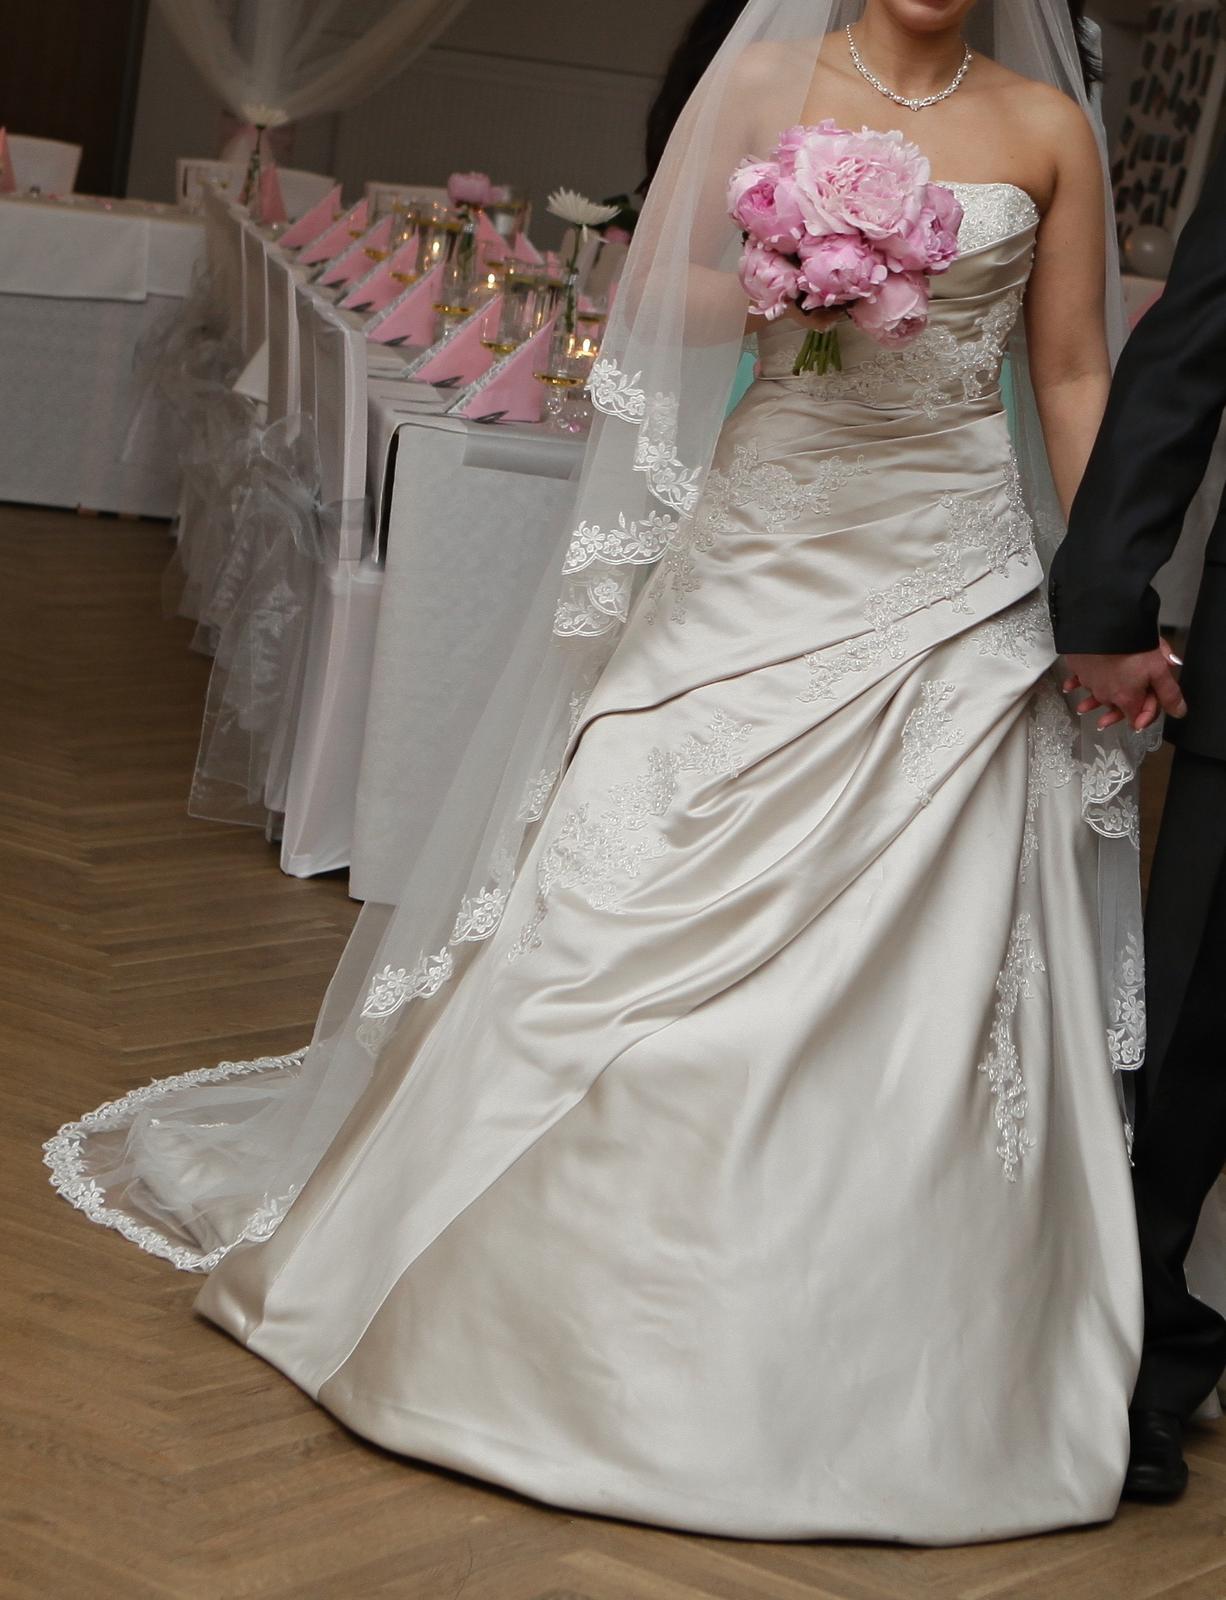 Svatebni Saty Pronovias Nicole Vel 36 38 38 6 500 Kc Svatebni